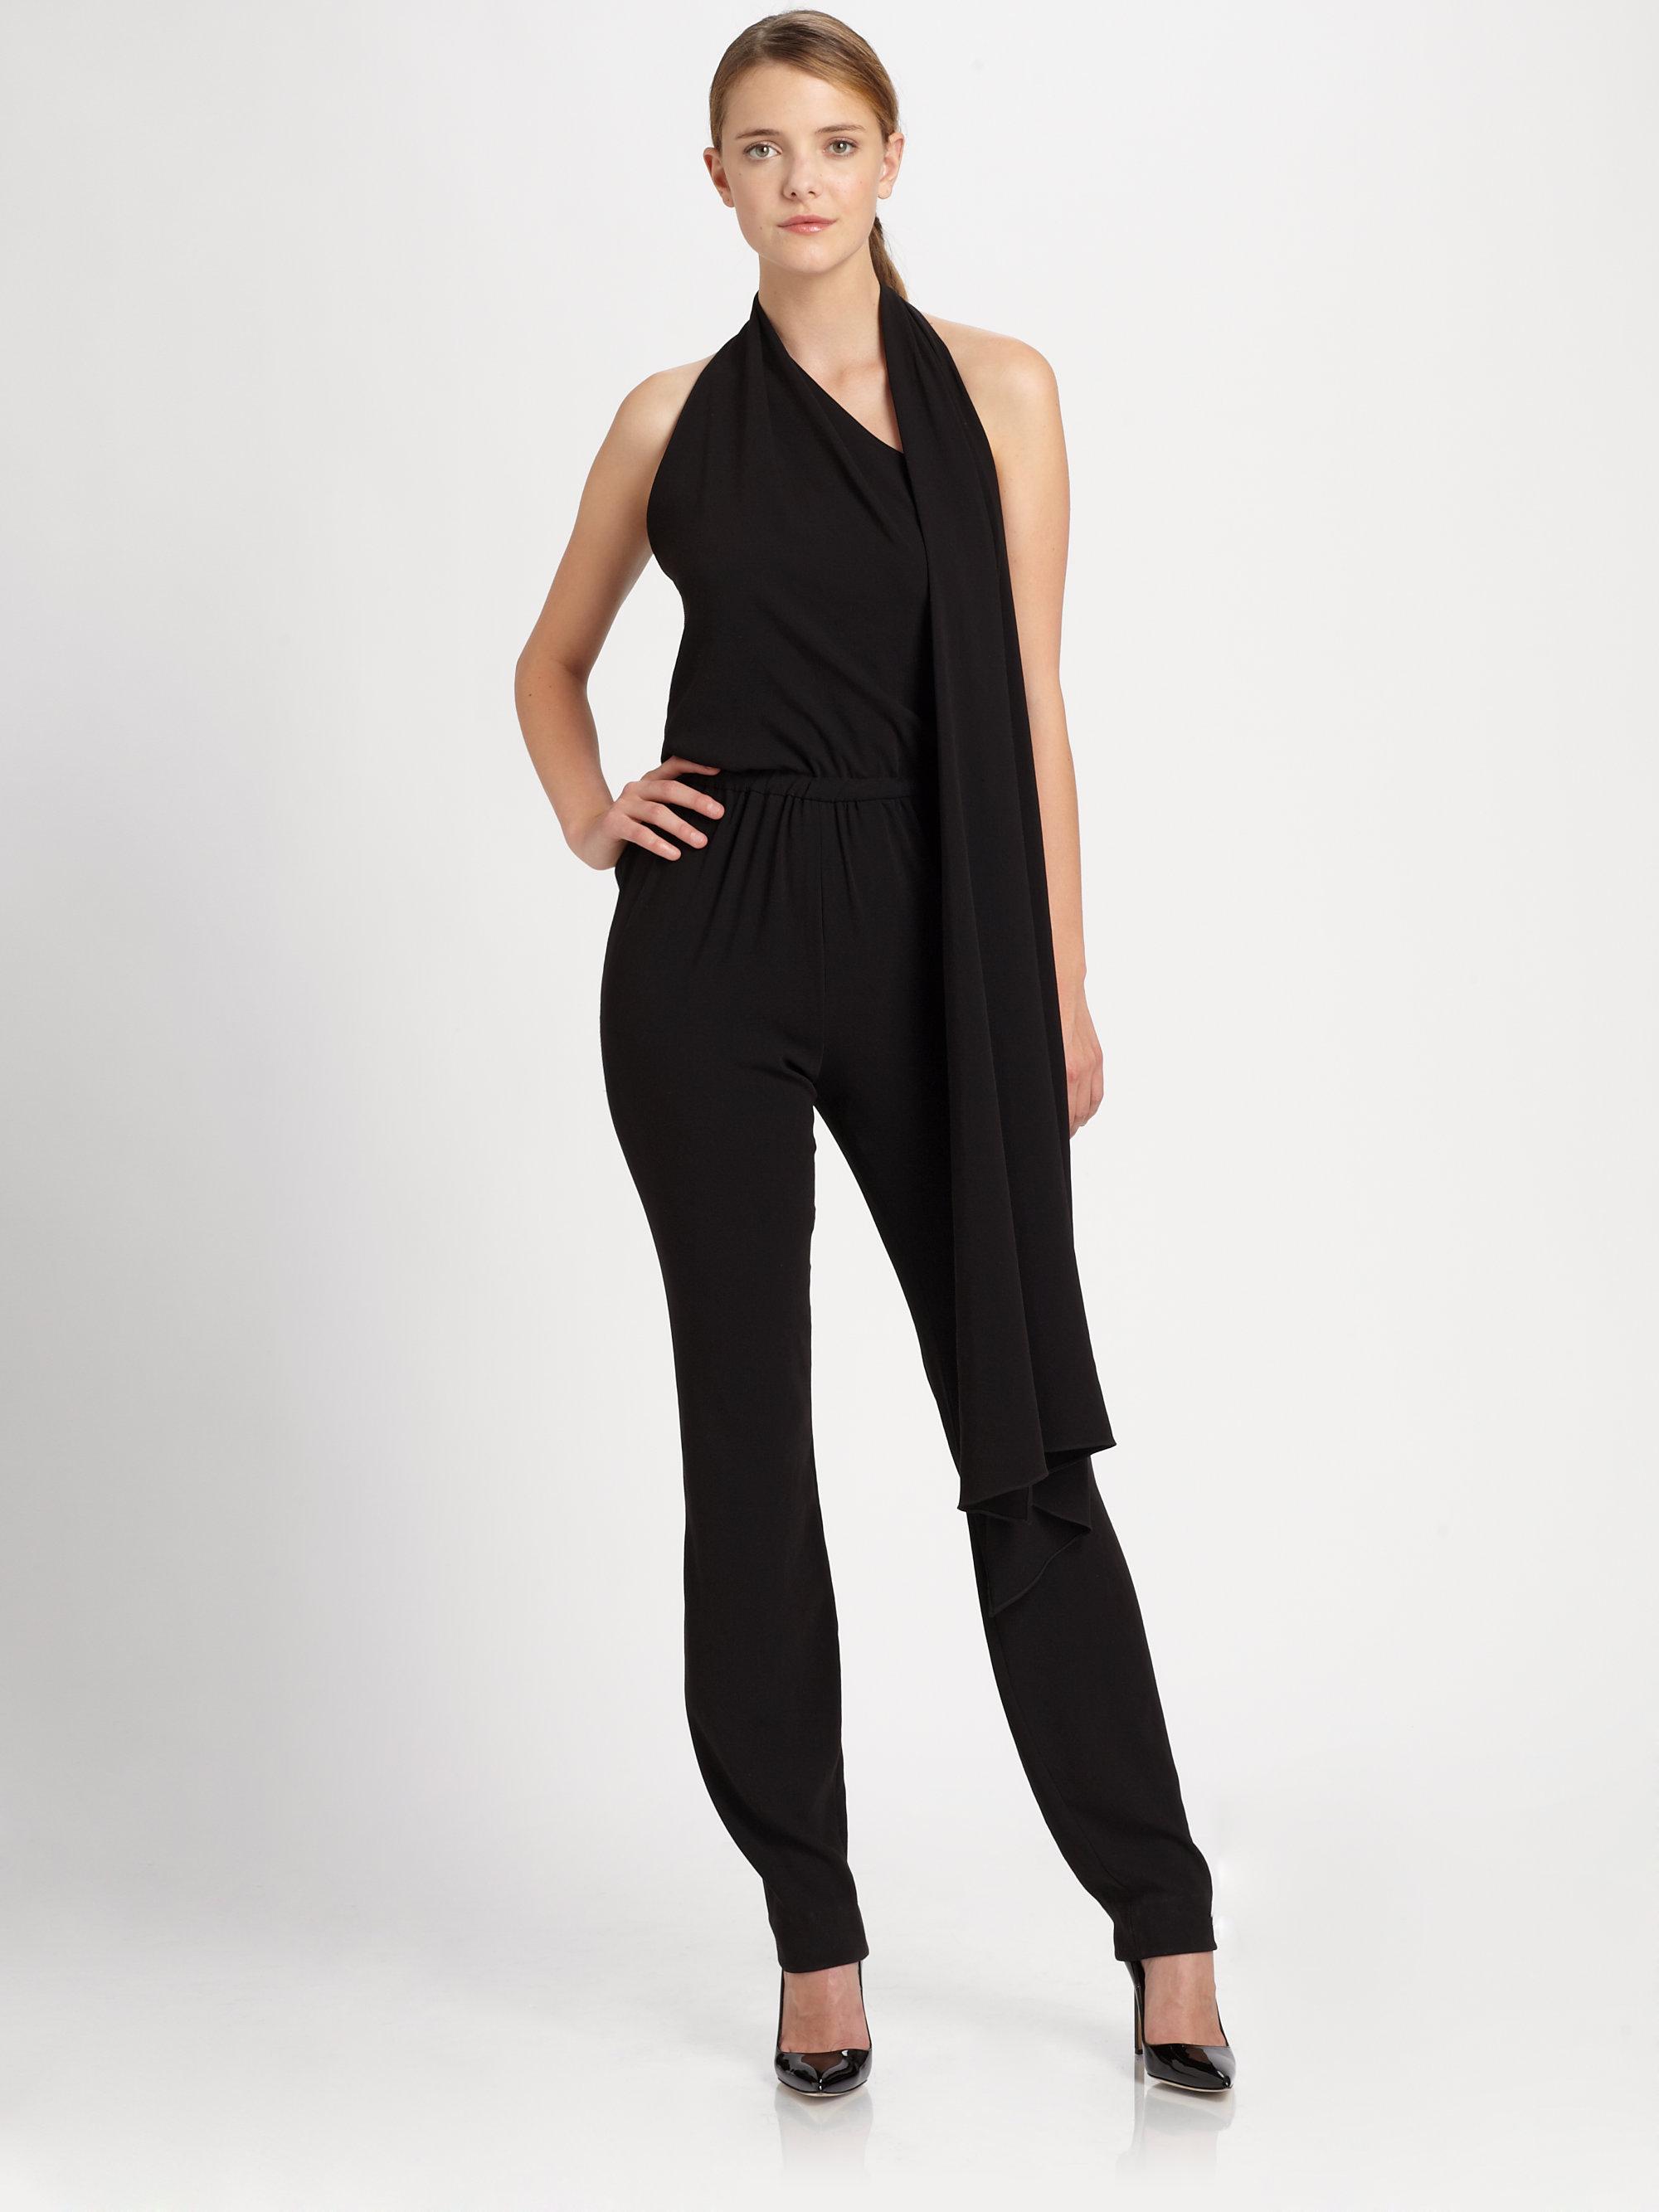 Halston Jersey Jumpsuit in Black | Lyst